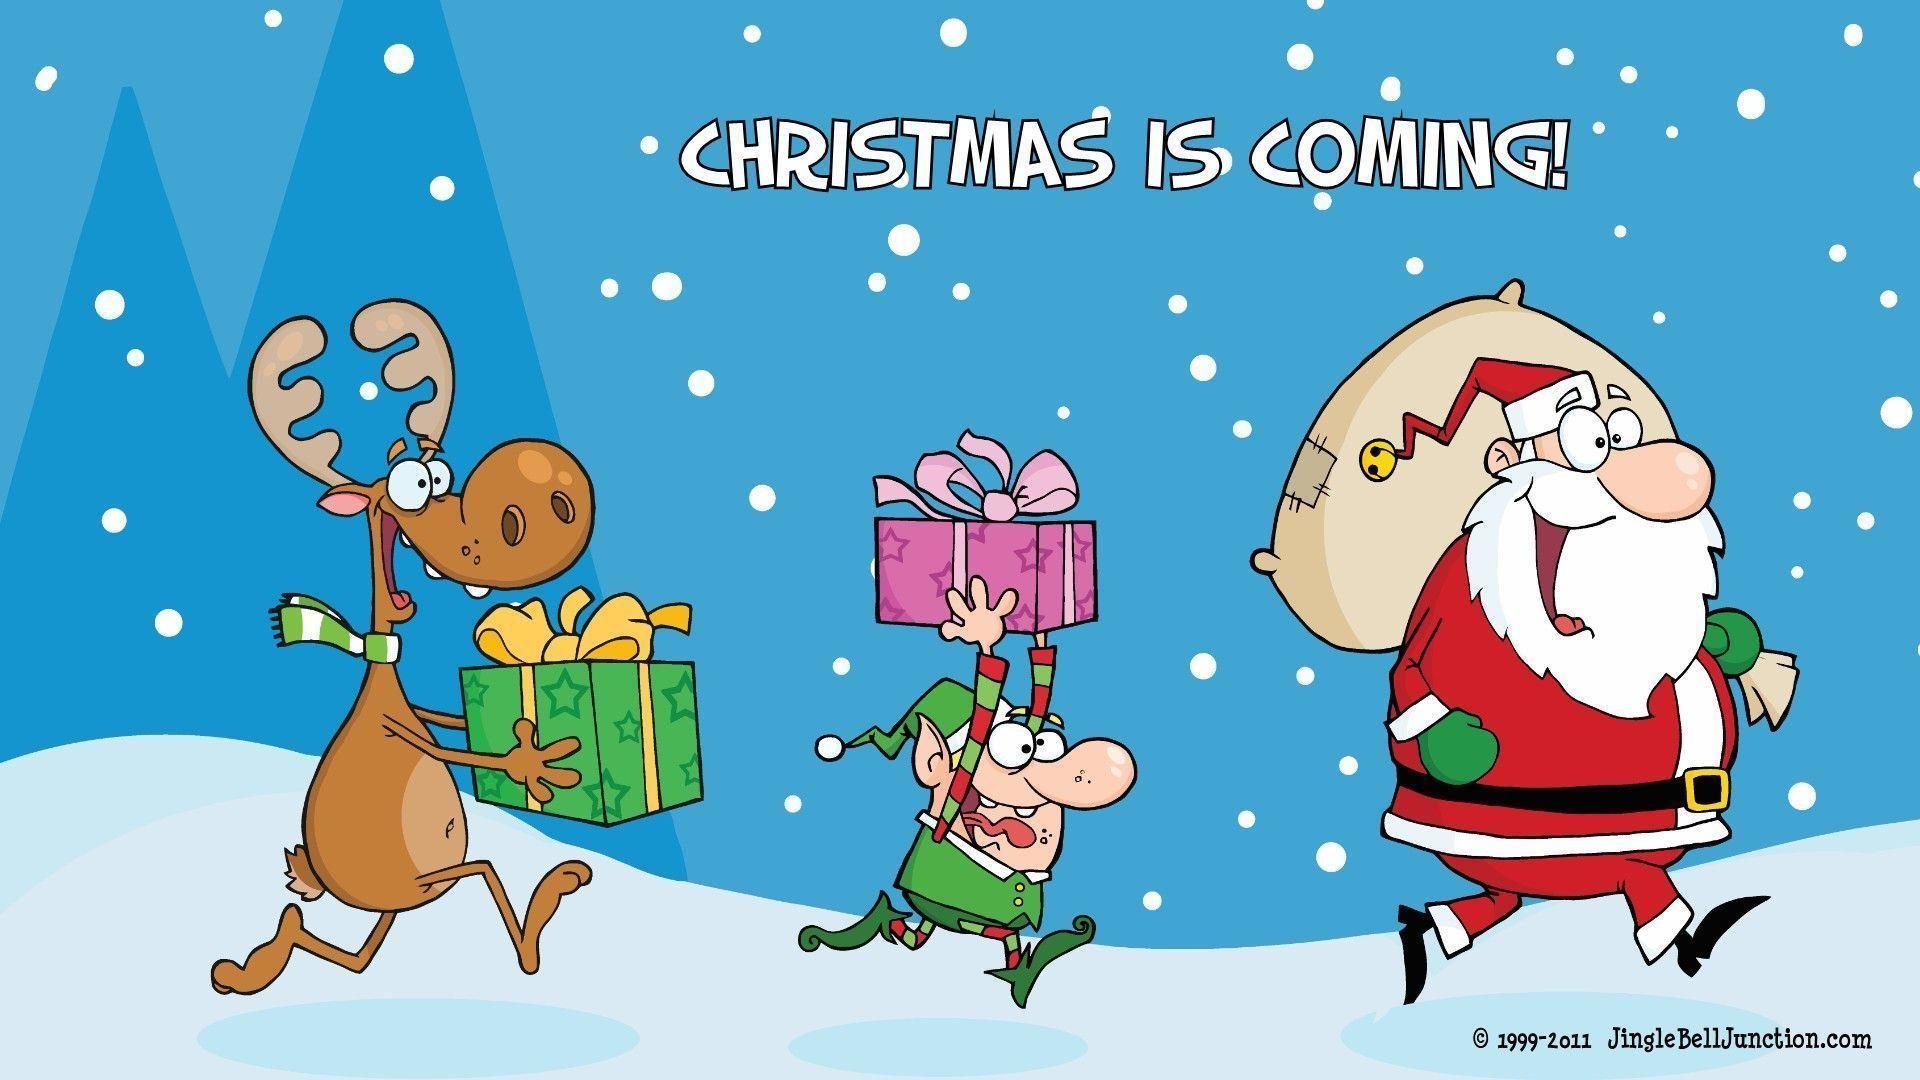 Christmas Jokes Wallpaper - Christmas Desktop Backgrounds Funny , HD Wallpaper & Backgrounds